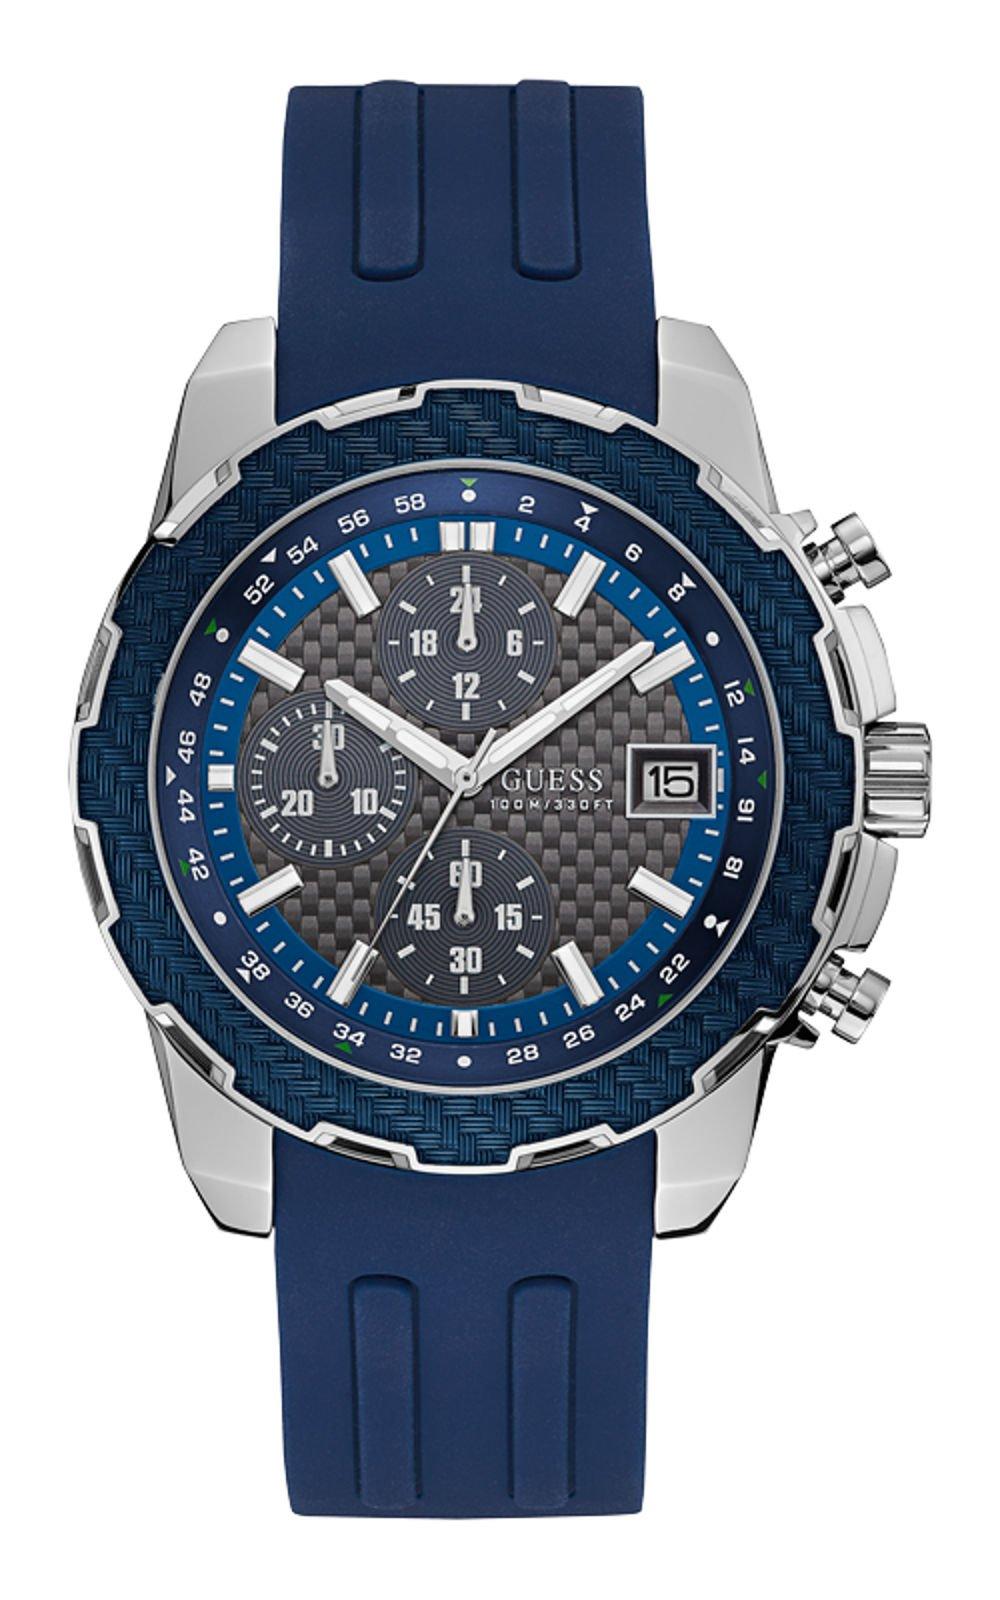 GUESS W1047G2 Ανδρικό Ρολόι Quartz Χρονογράφος Ακριβείας